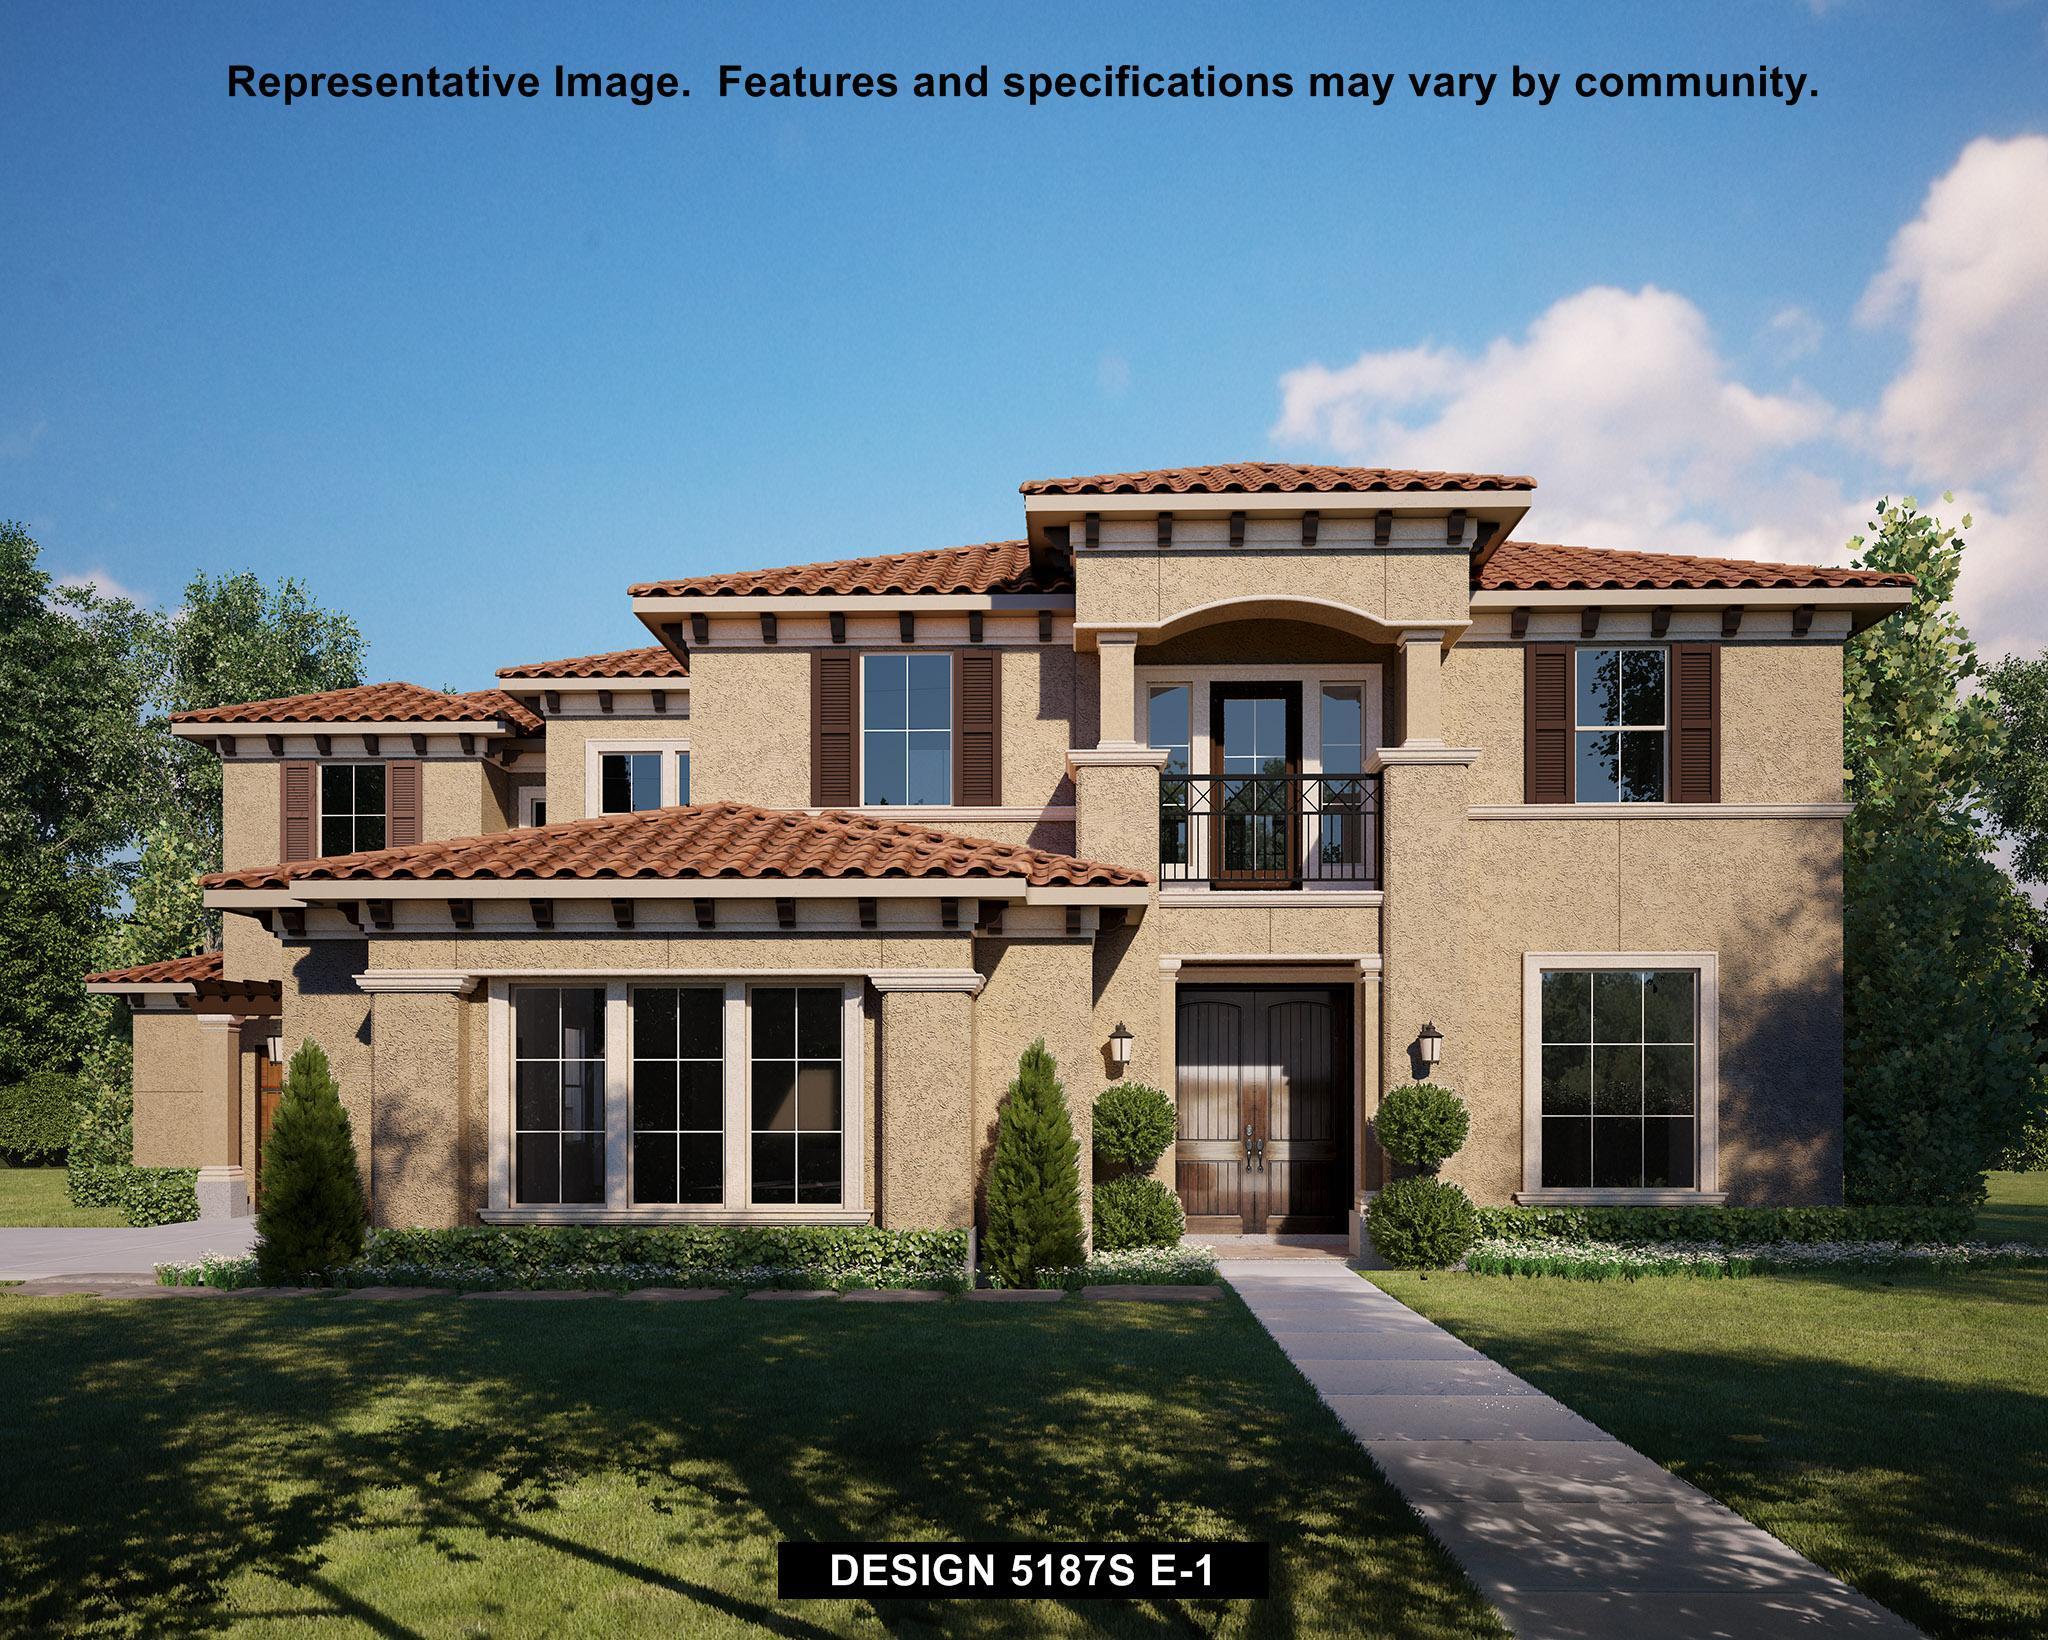 Single Family for Sale at Bridgeland 100' - Hidden Creek Estates - 5187s 19014 East Josey Overlook Drive Cypress, Texas 77433 United States